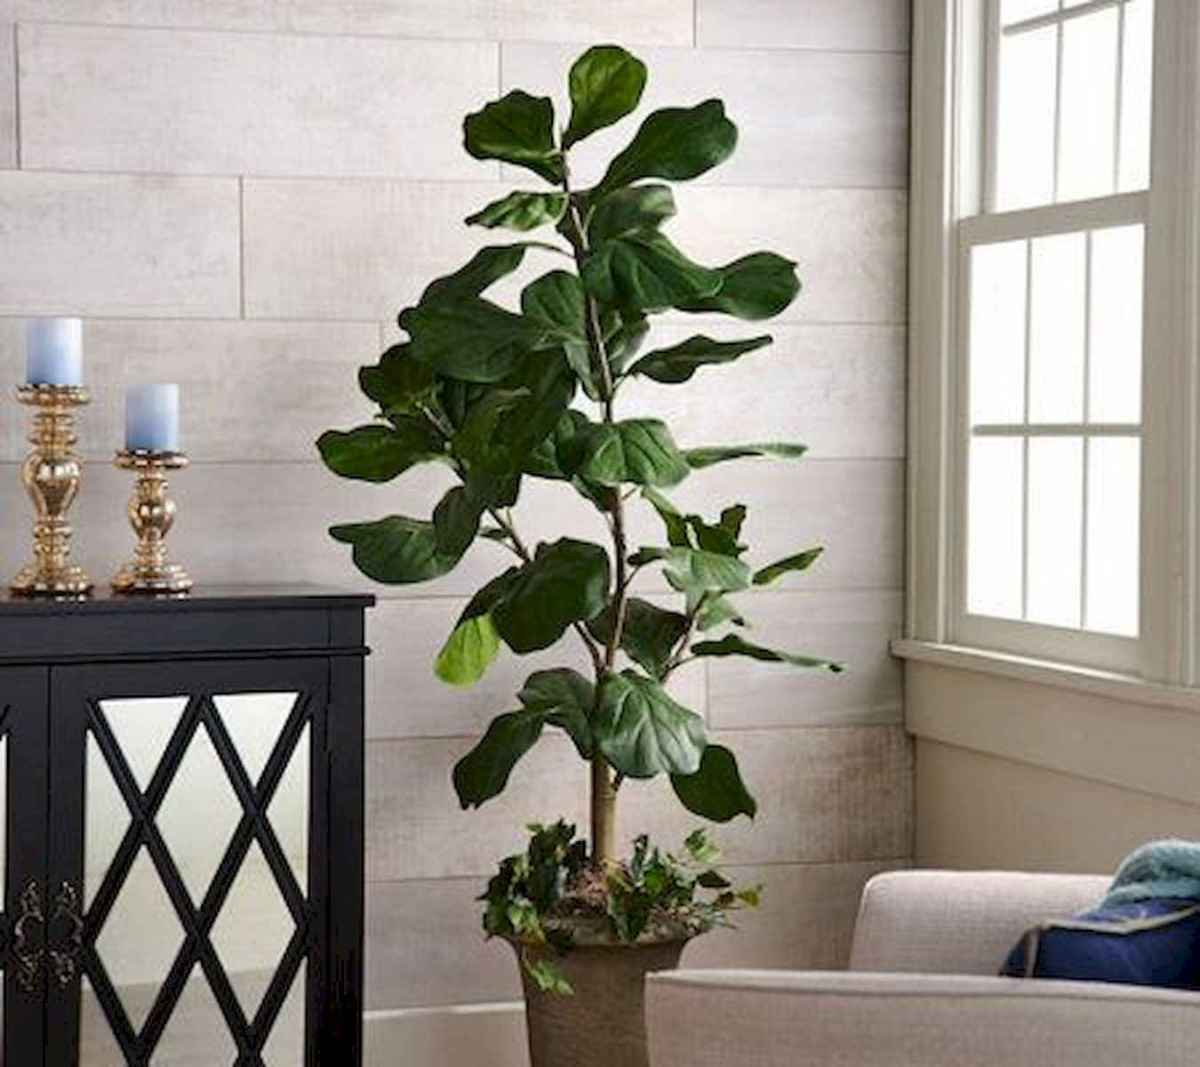 50 Best Indoor Garden For Apartment Design Ideas And Remodel (24)